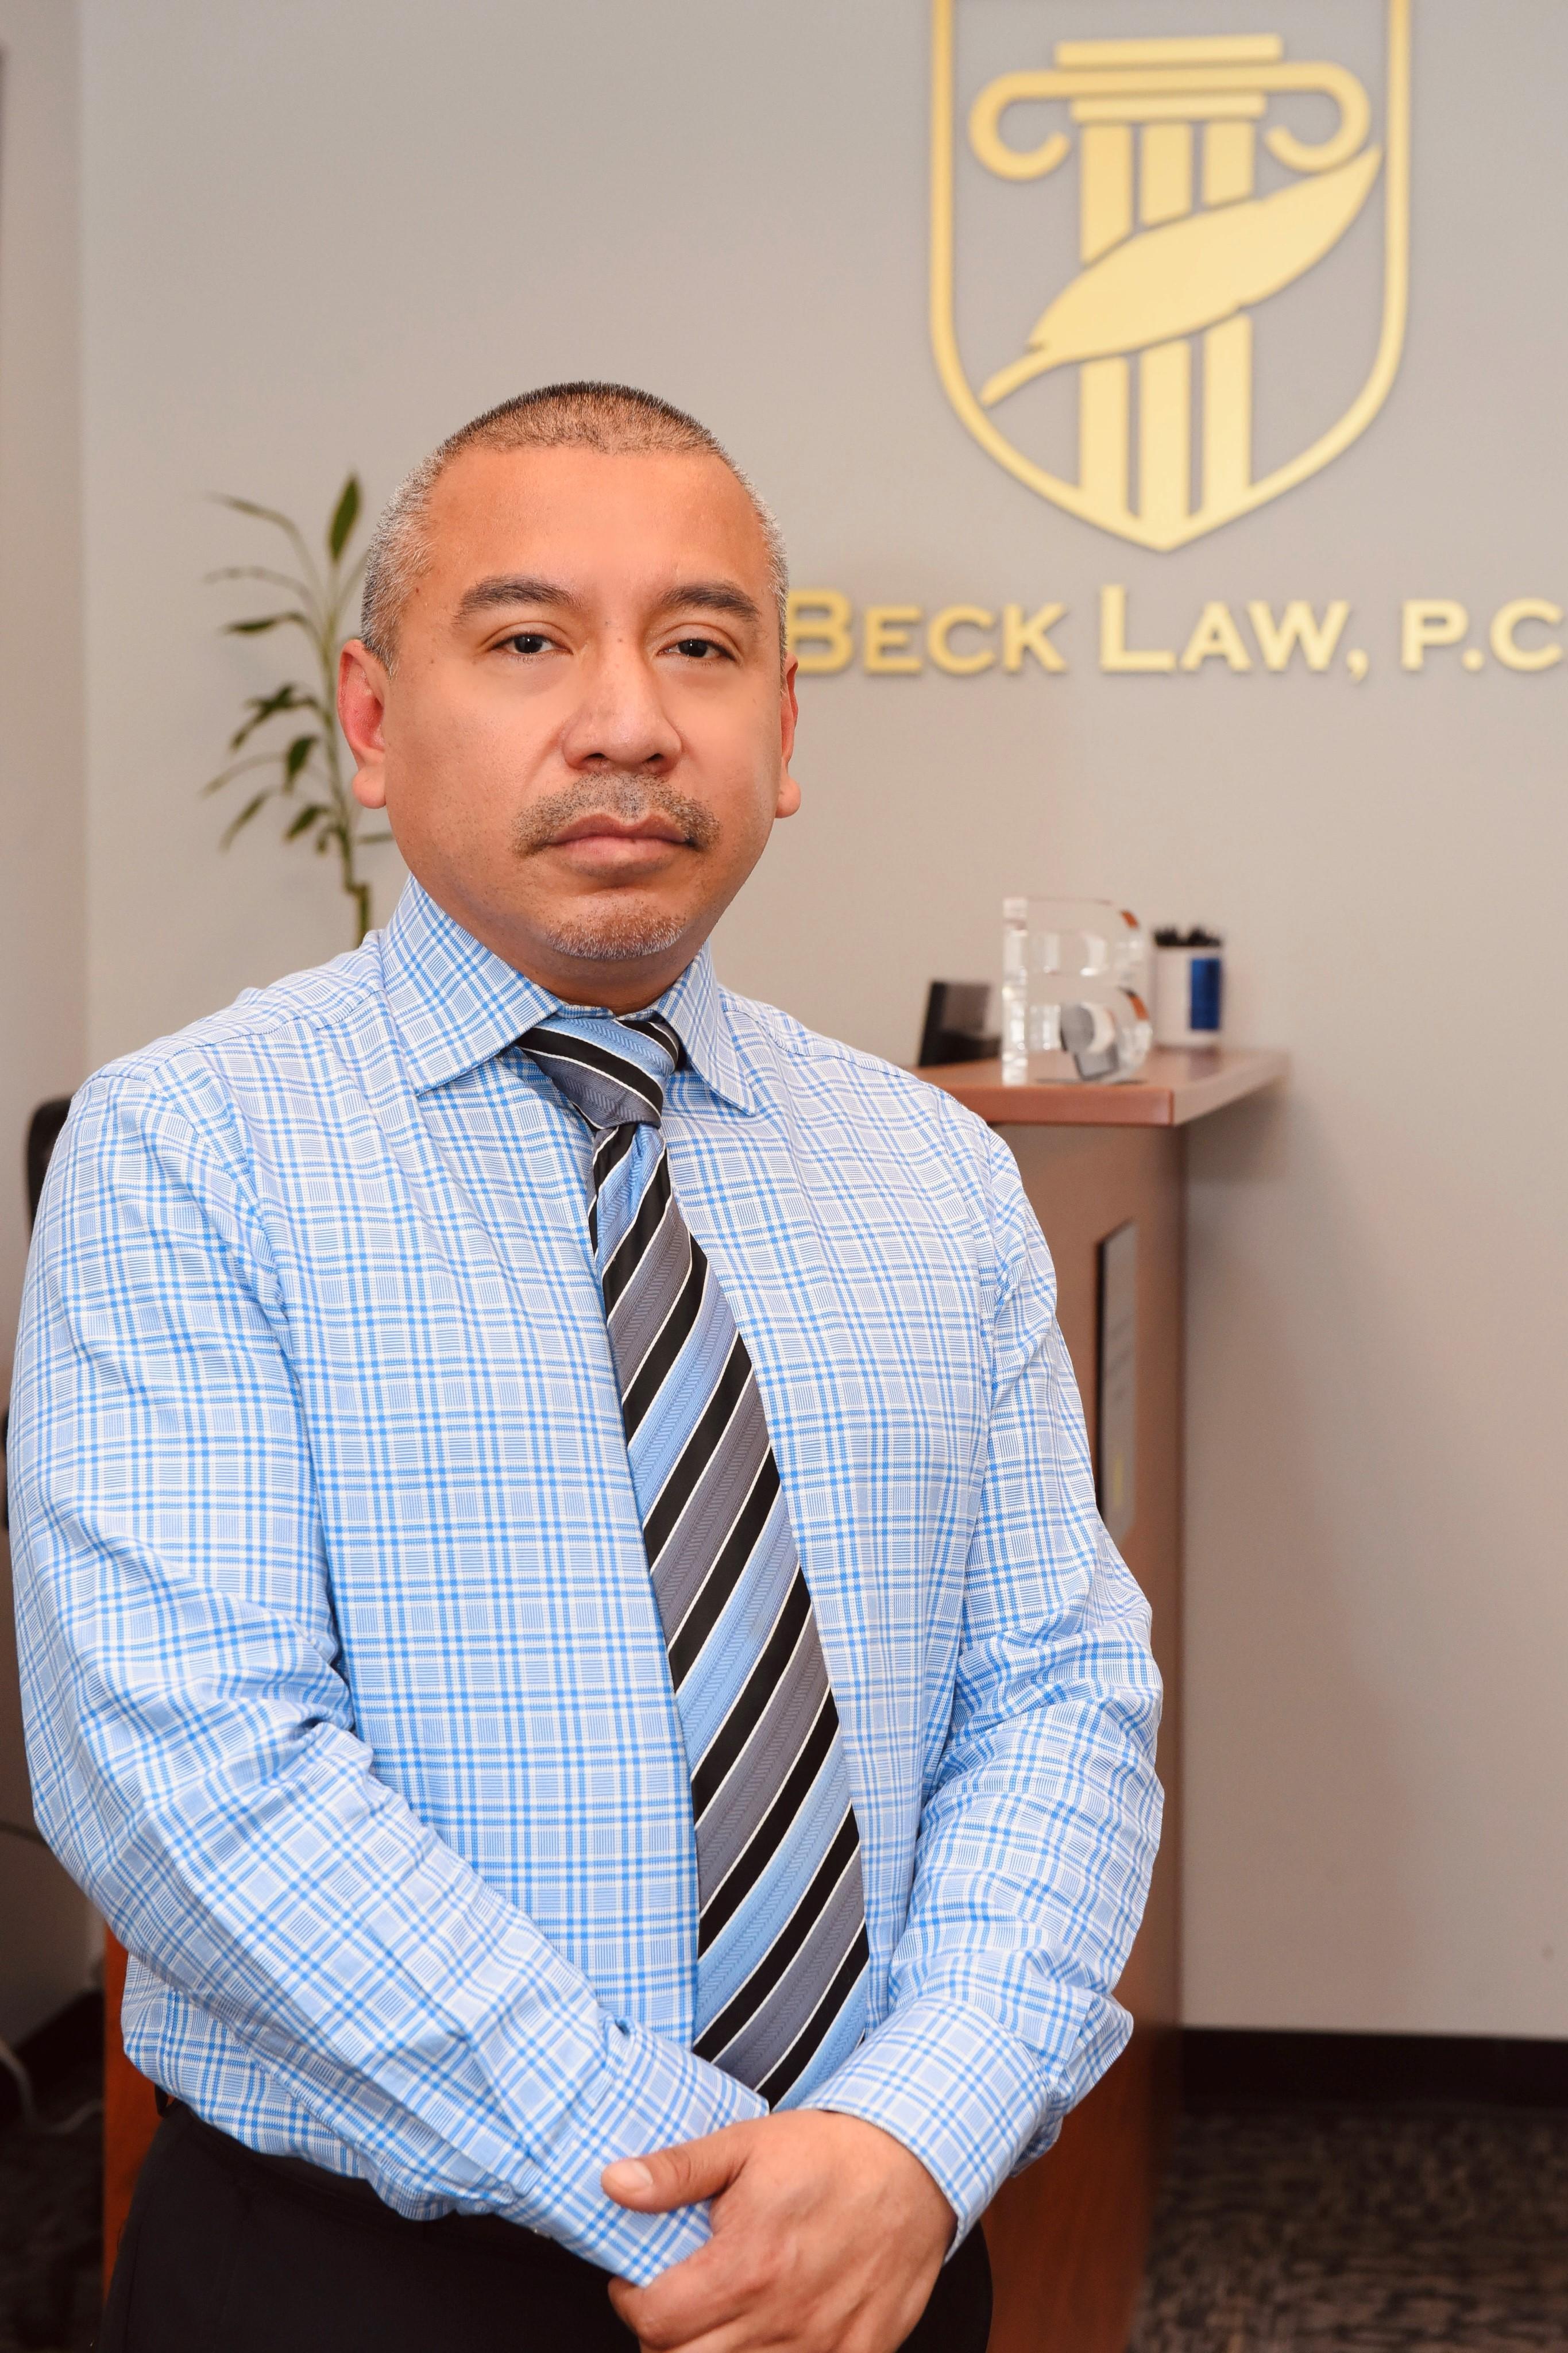 Boris Pinto - BECK LAW, P.C.